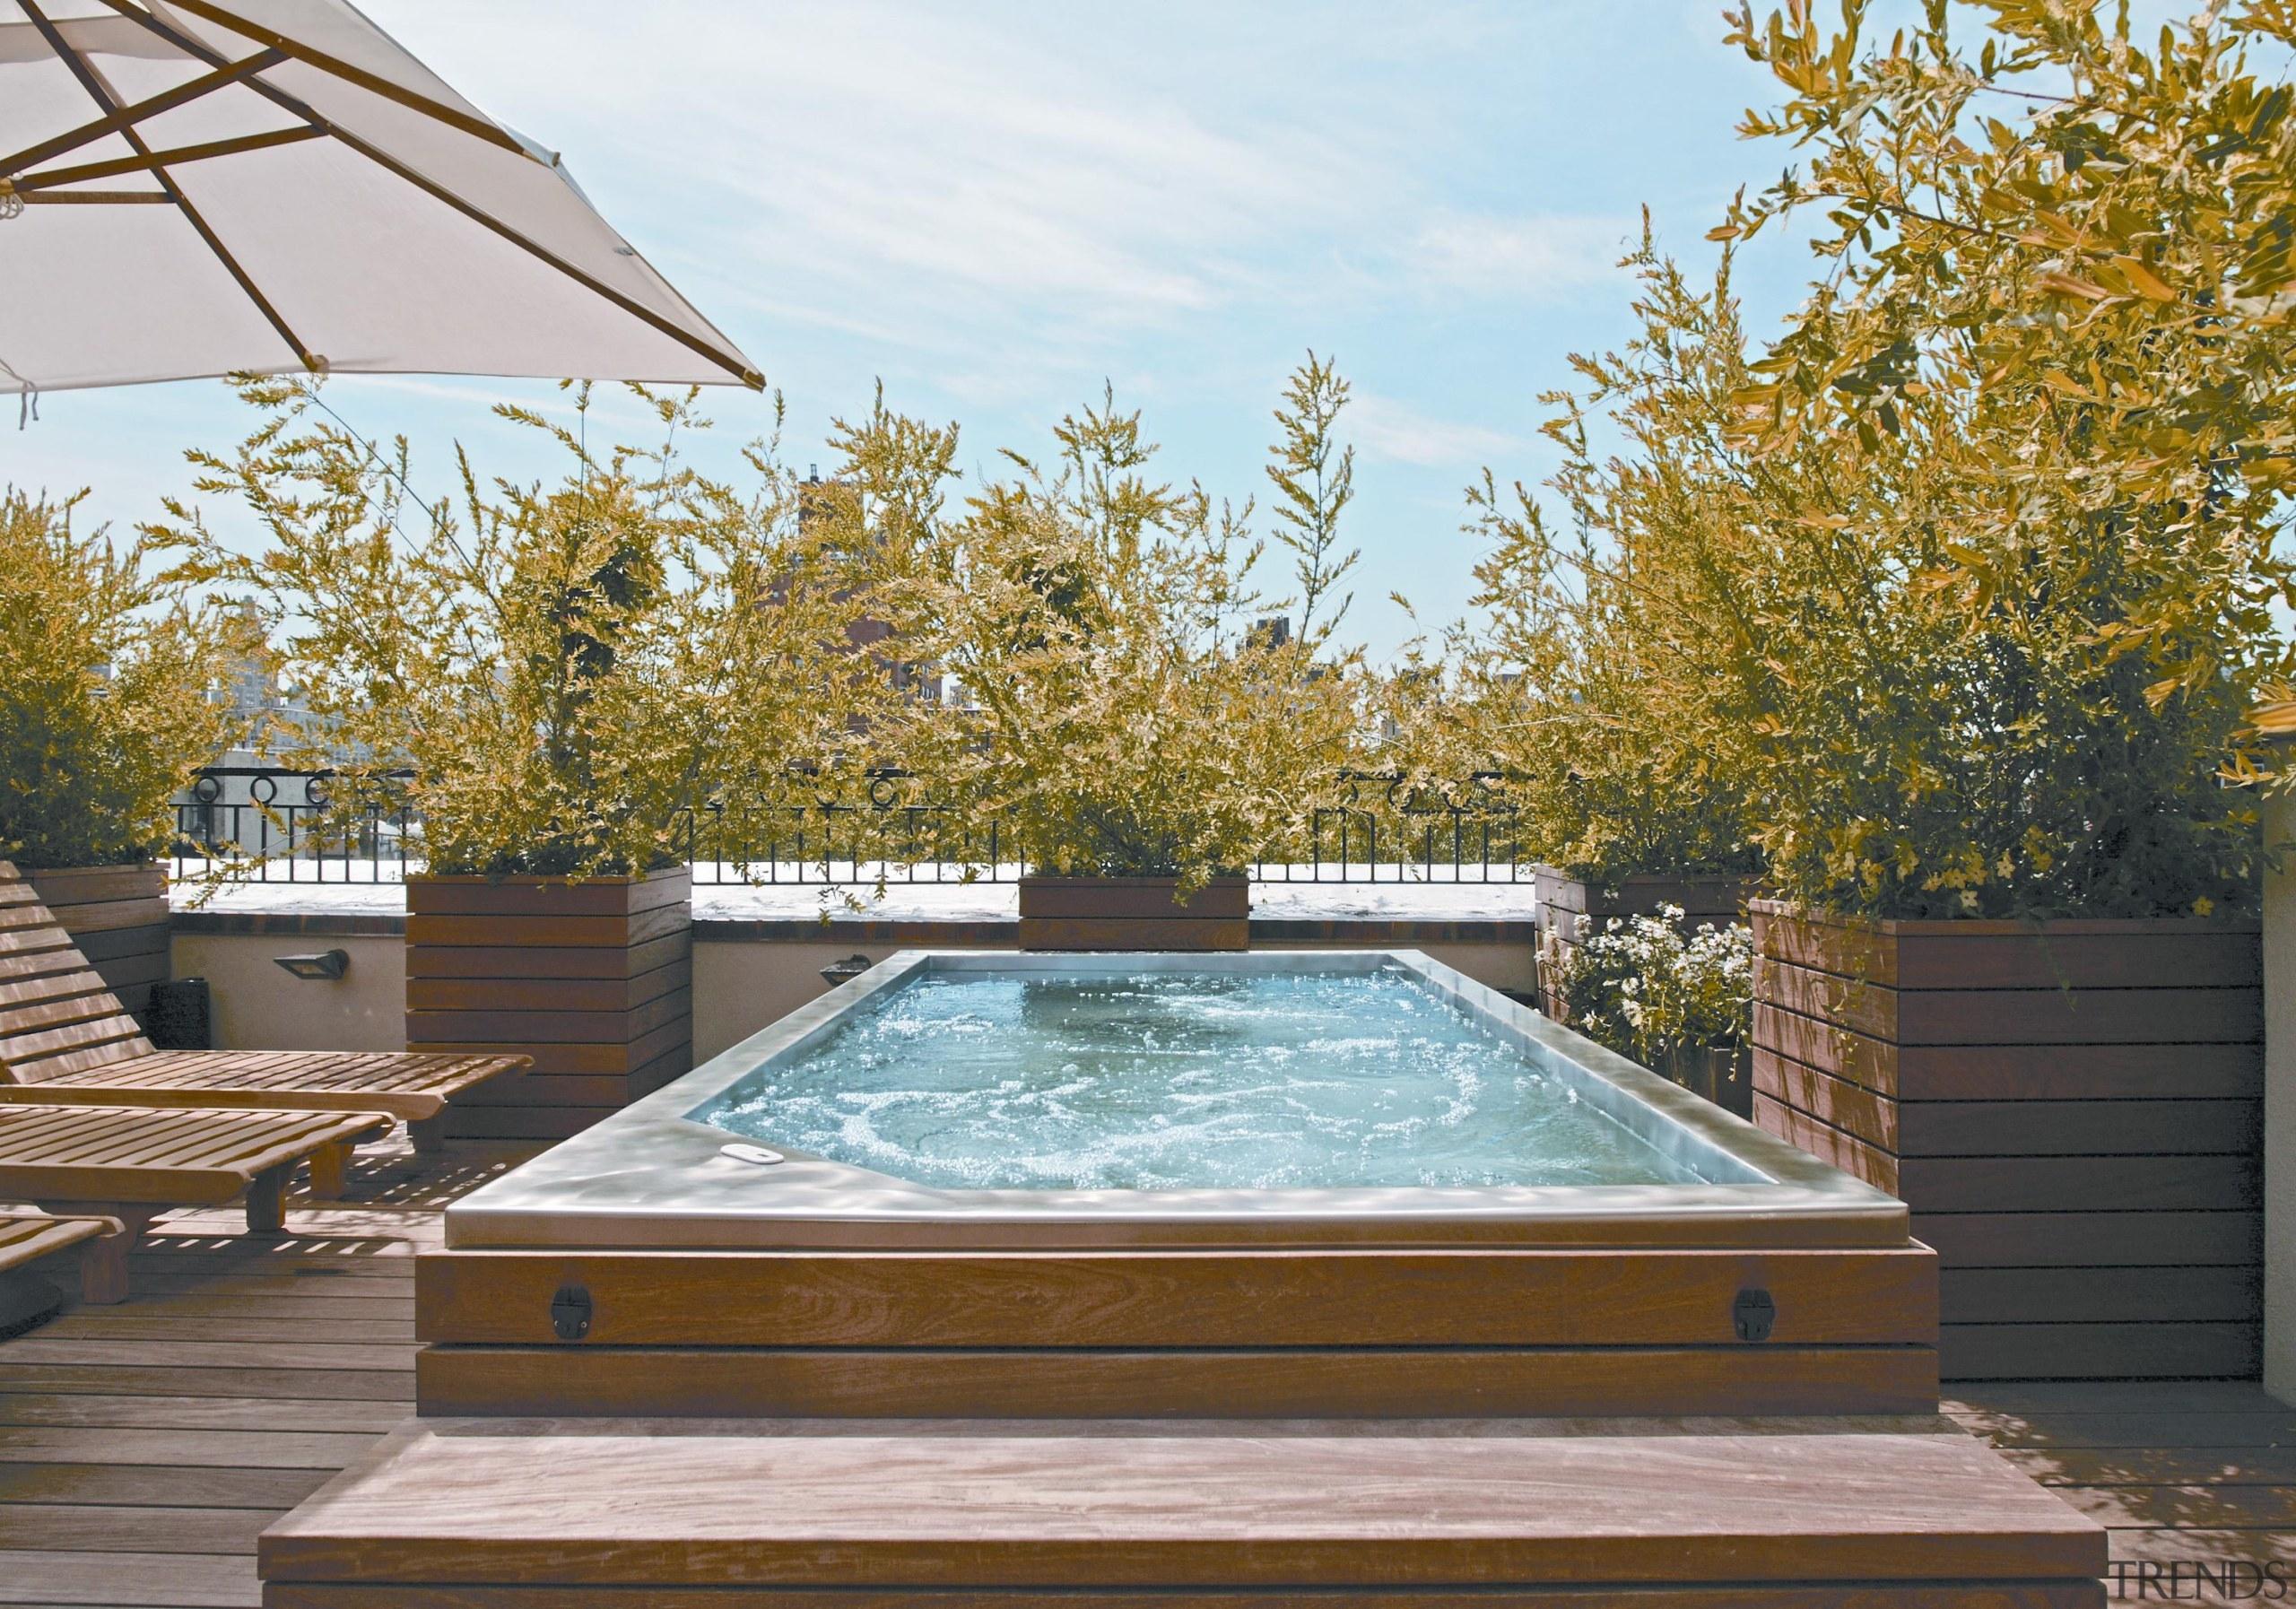 Rooftop spa - Rooftop spa - daylighting   daylighting, property, real estate, swimming pool, brown, white